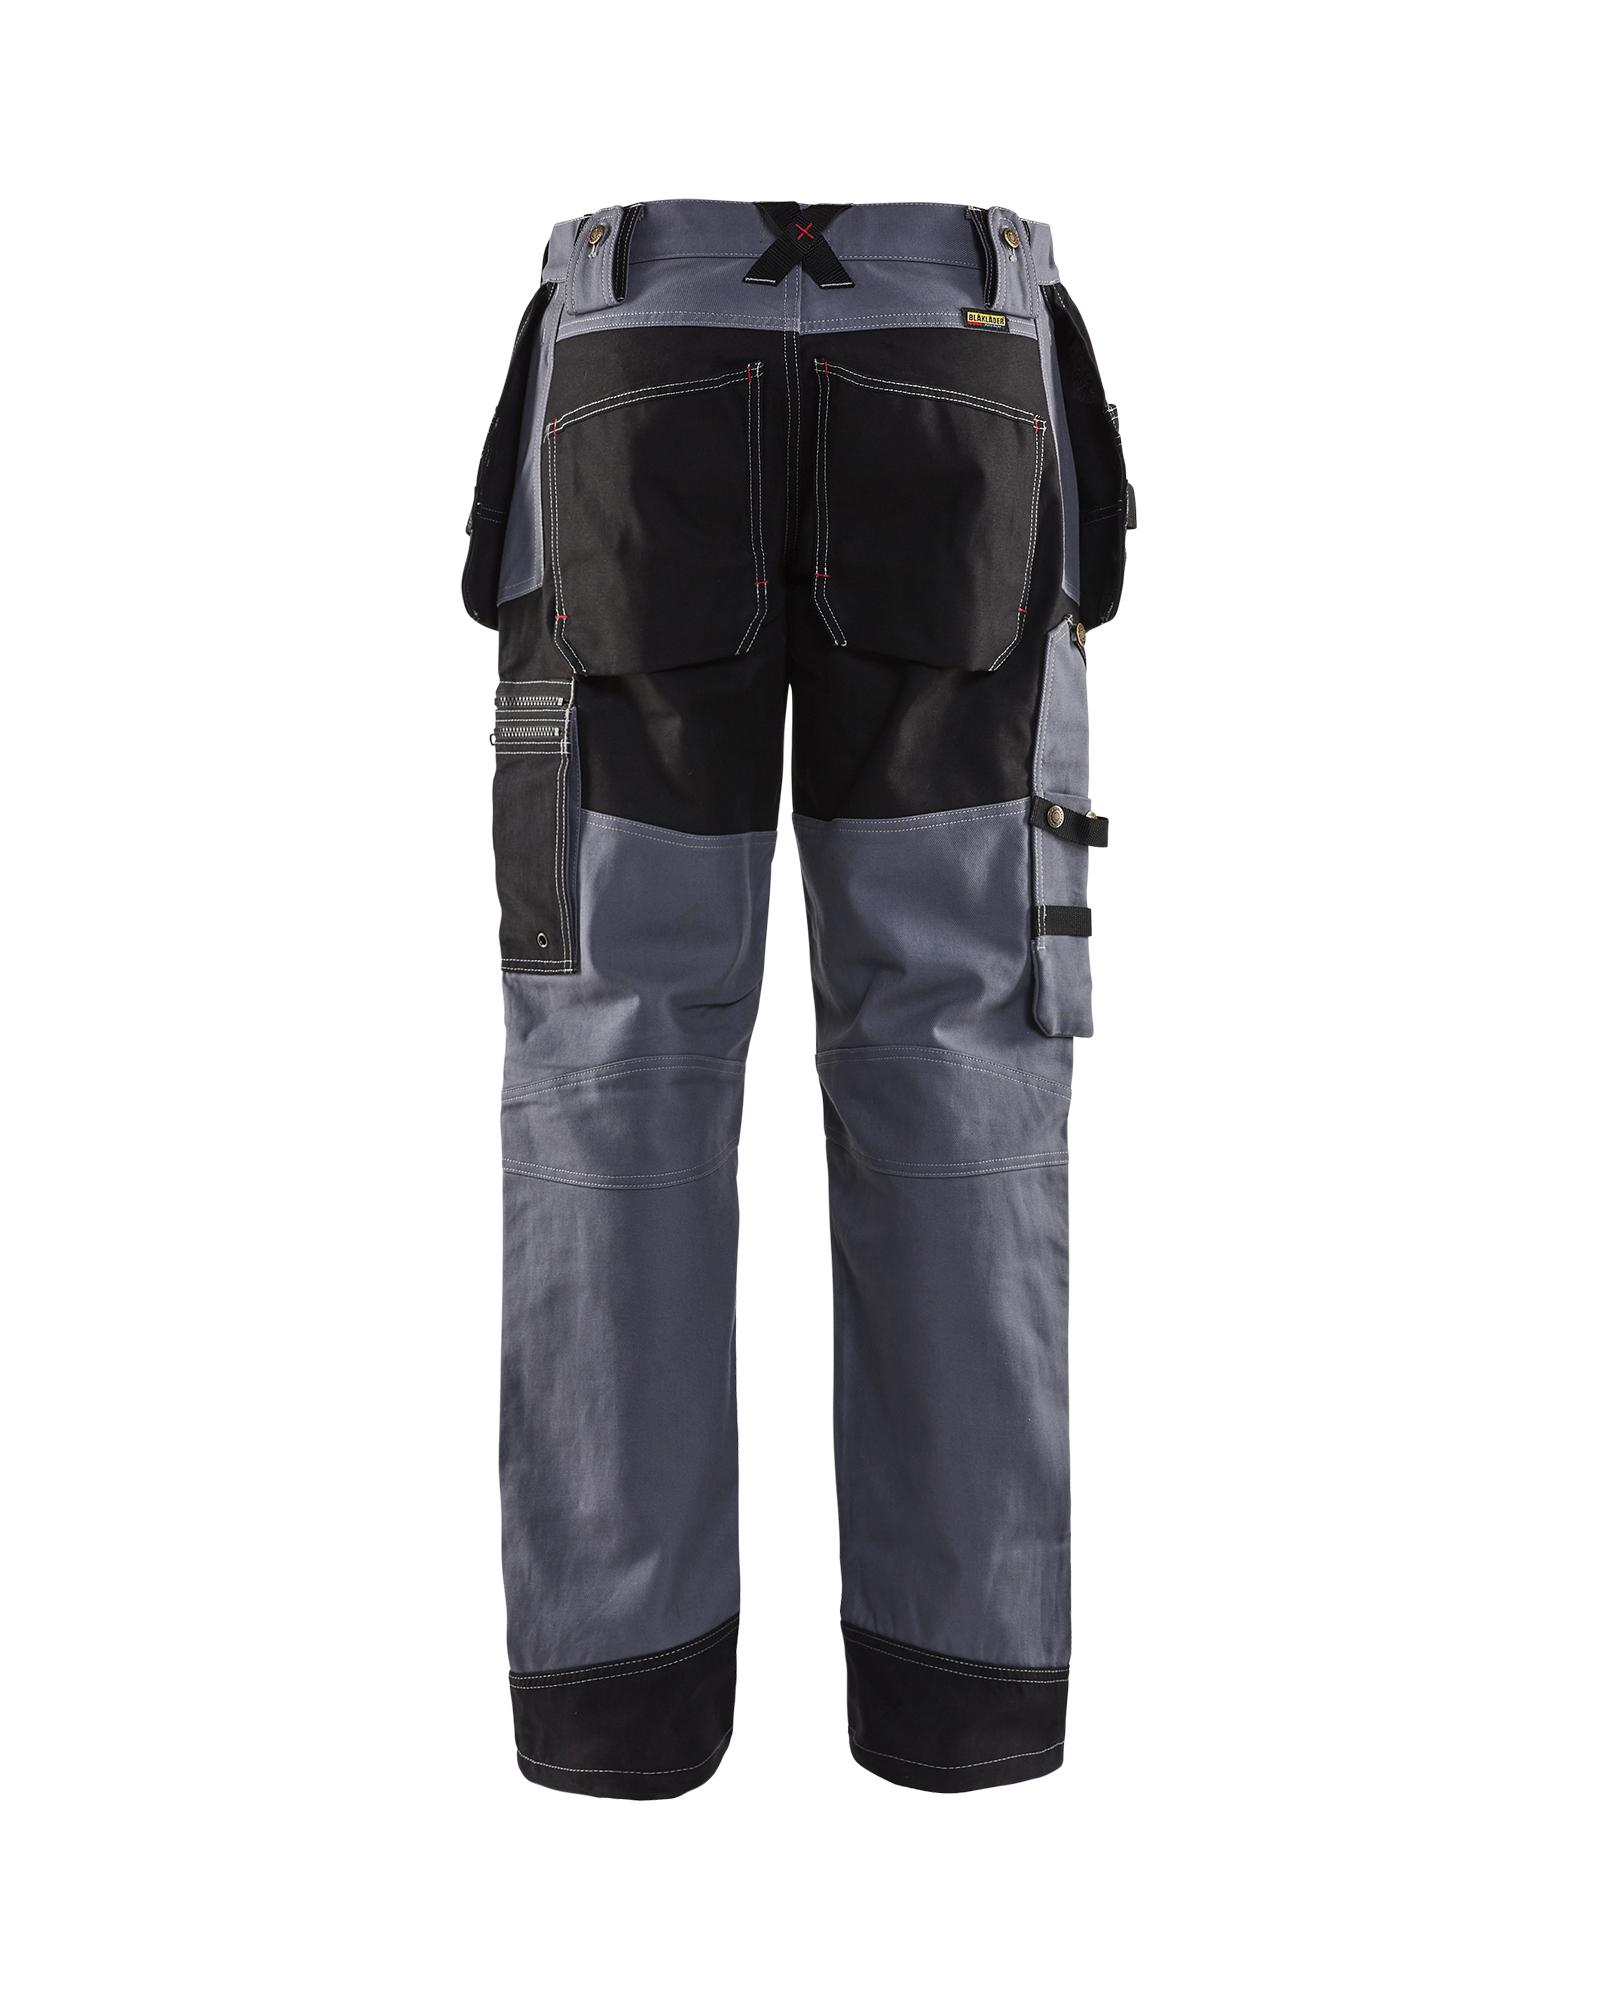 03ccade95cf Ripptaskutega püksid X1500 (15001370) - Blaklader